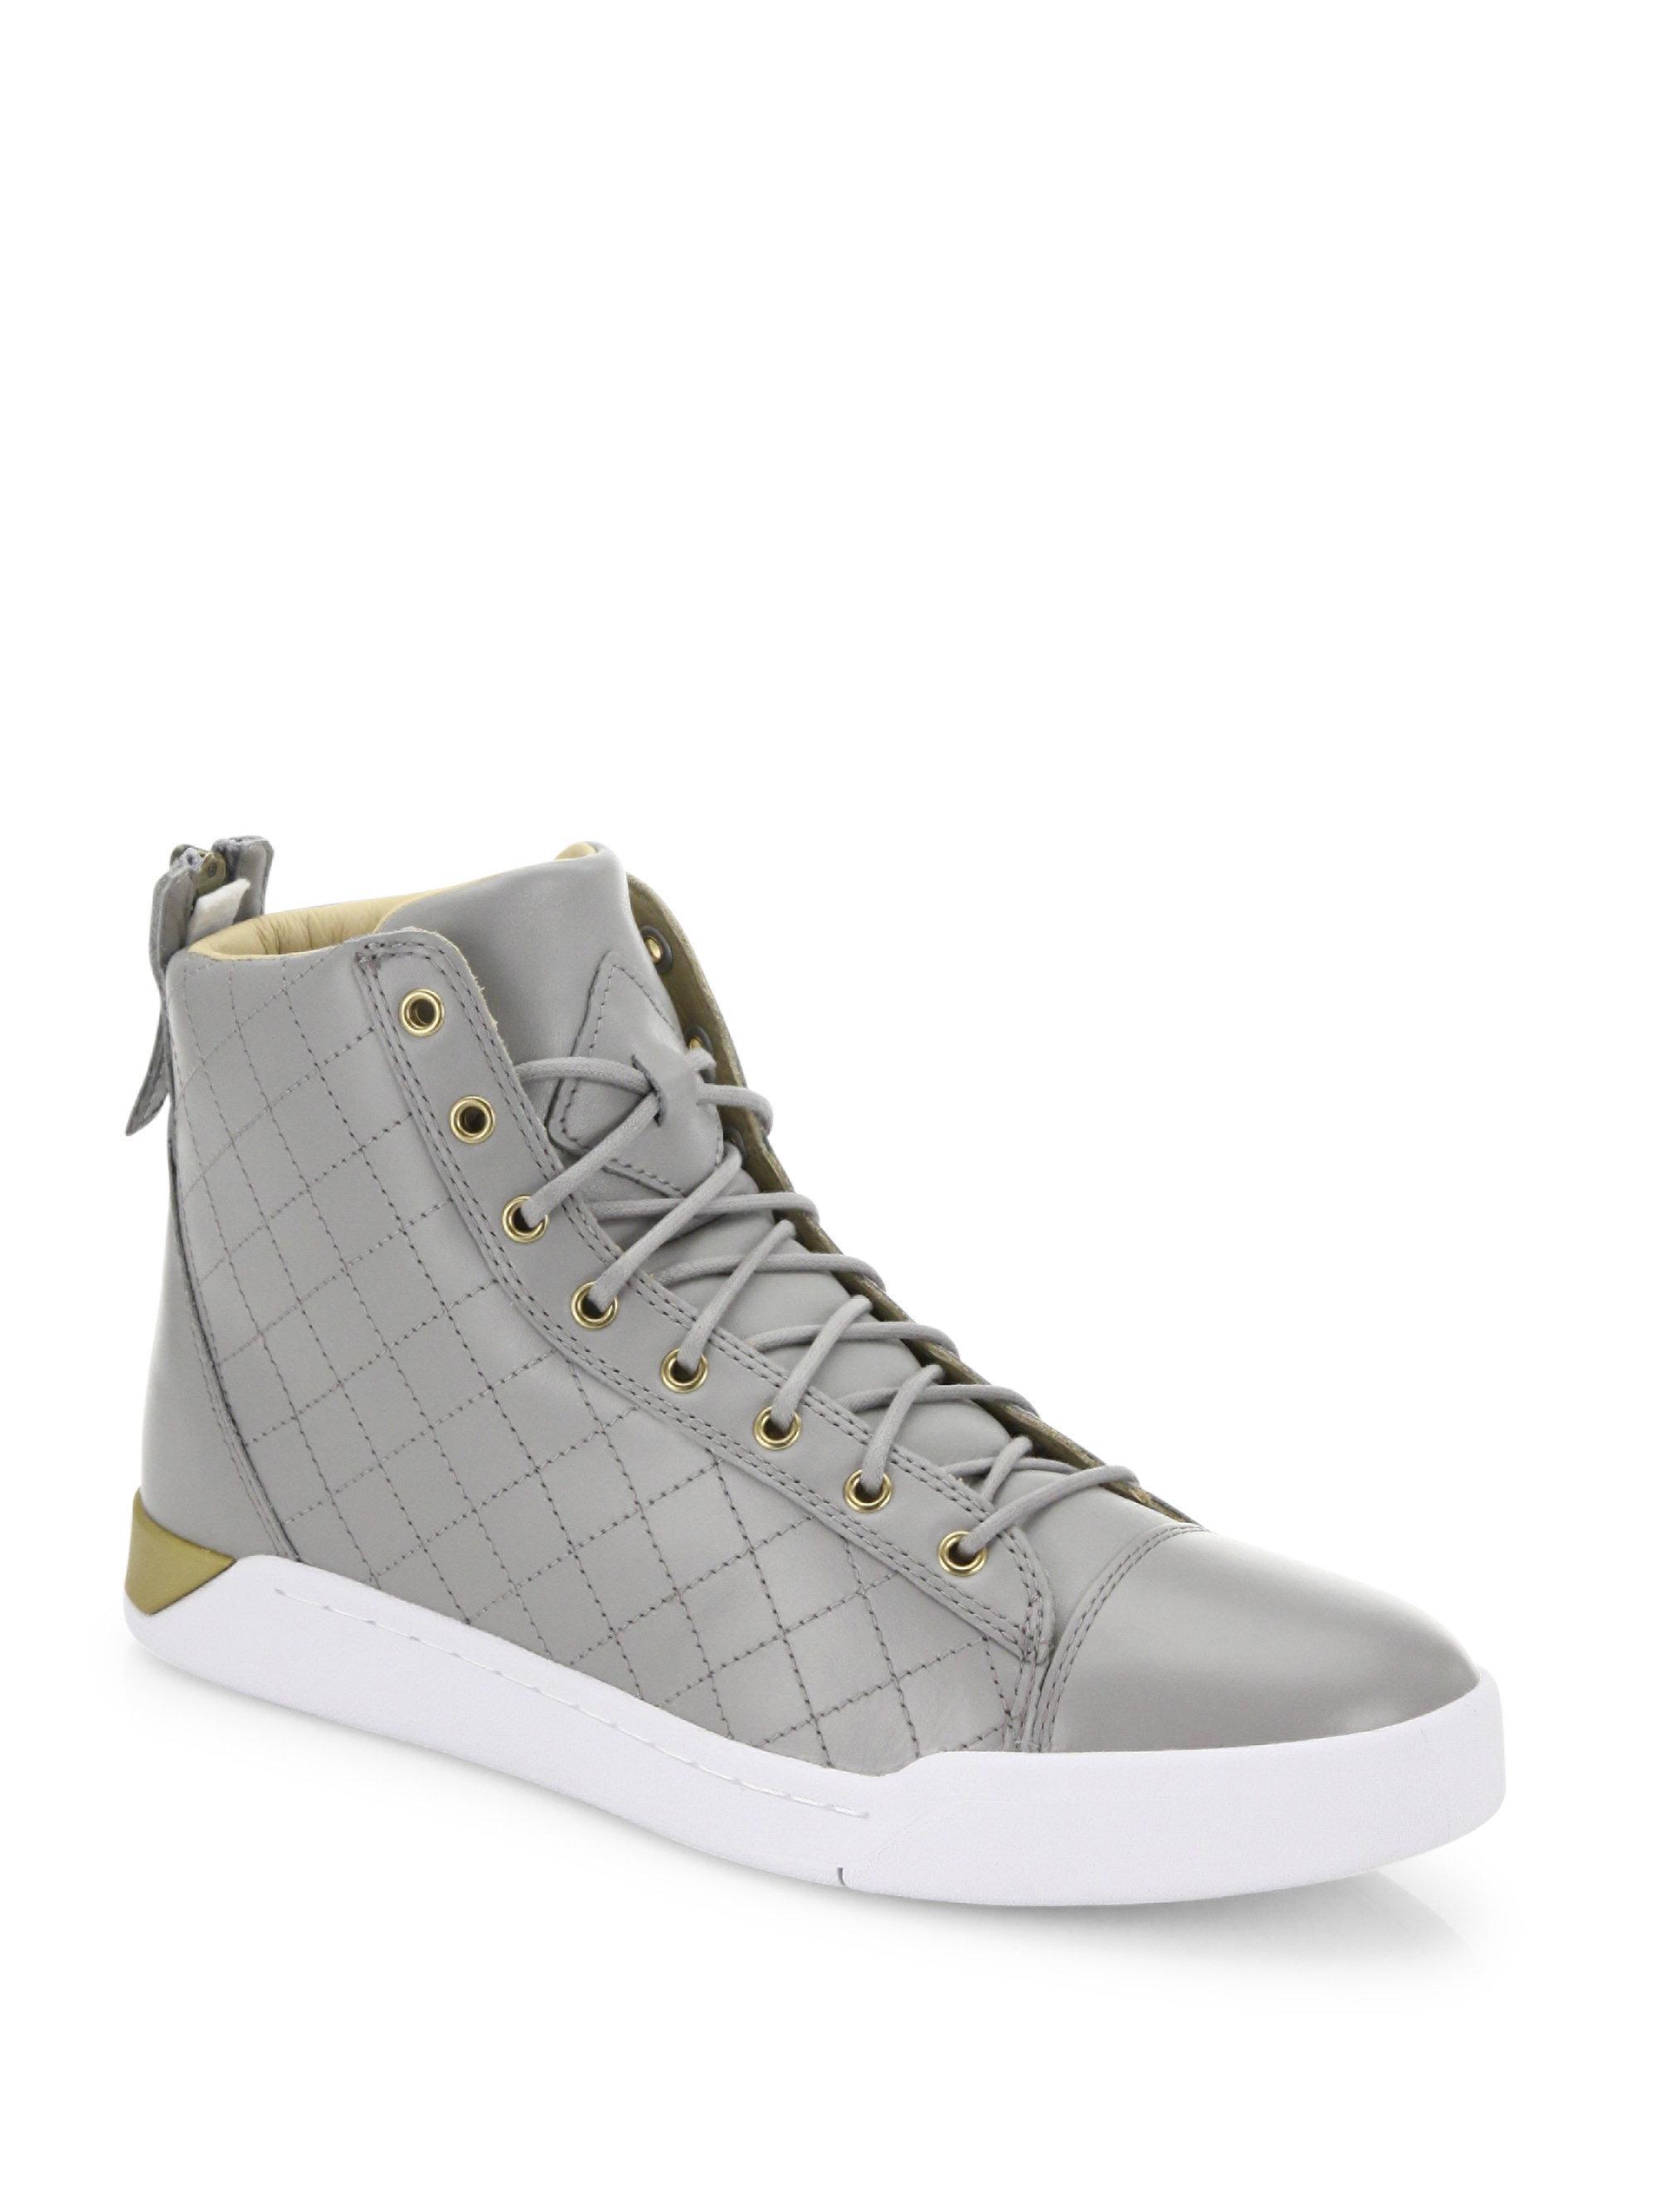 49f536c981 Lyst - DIESEL Tempus Diamond Leather Mid-top Sneakers in Gray for Men